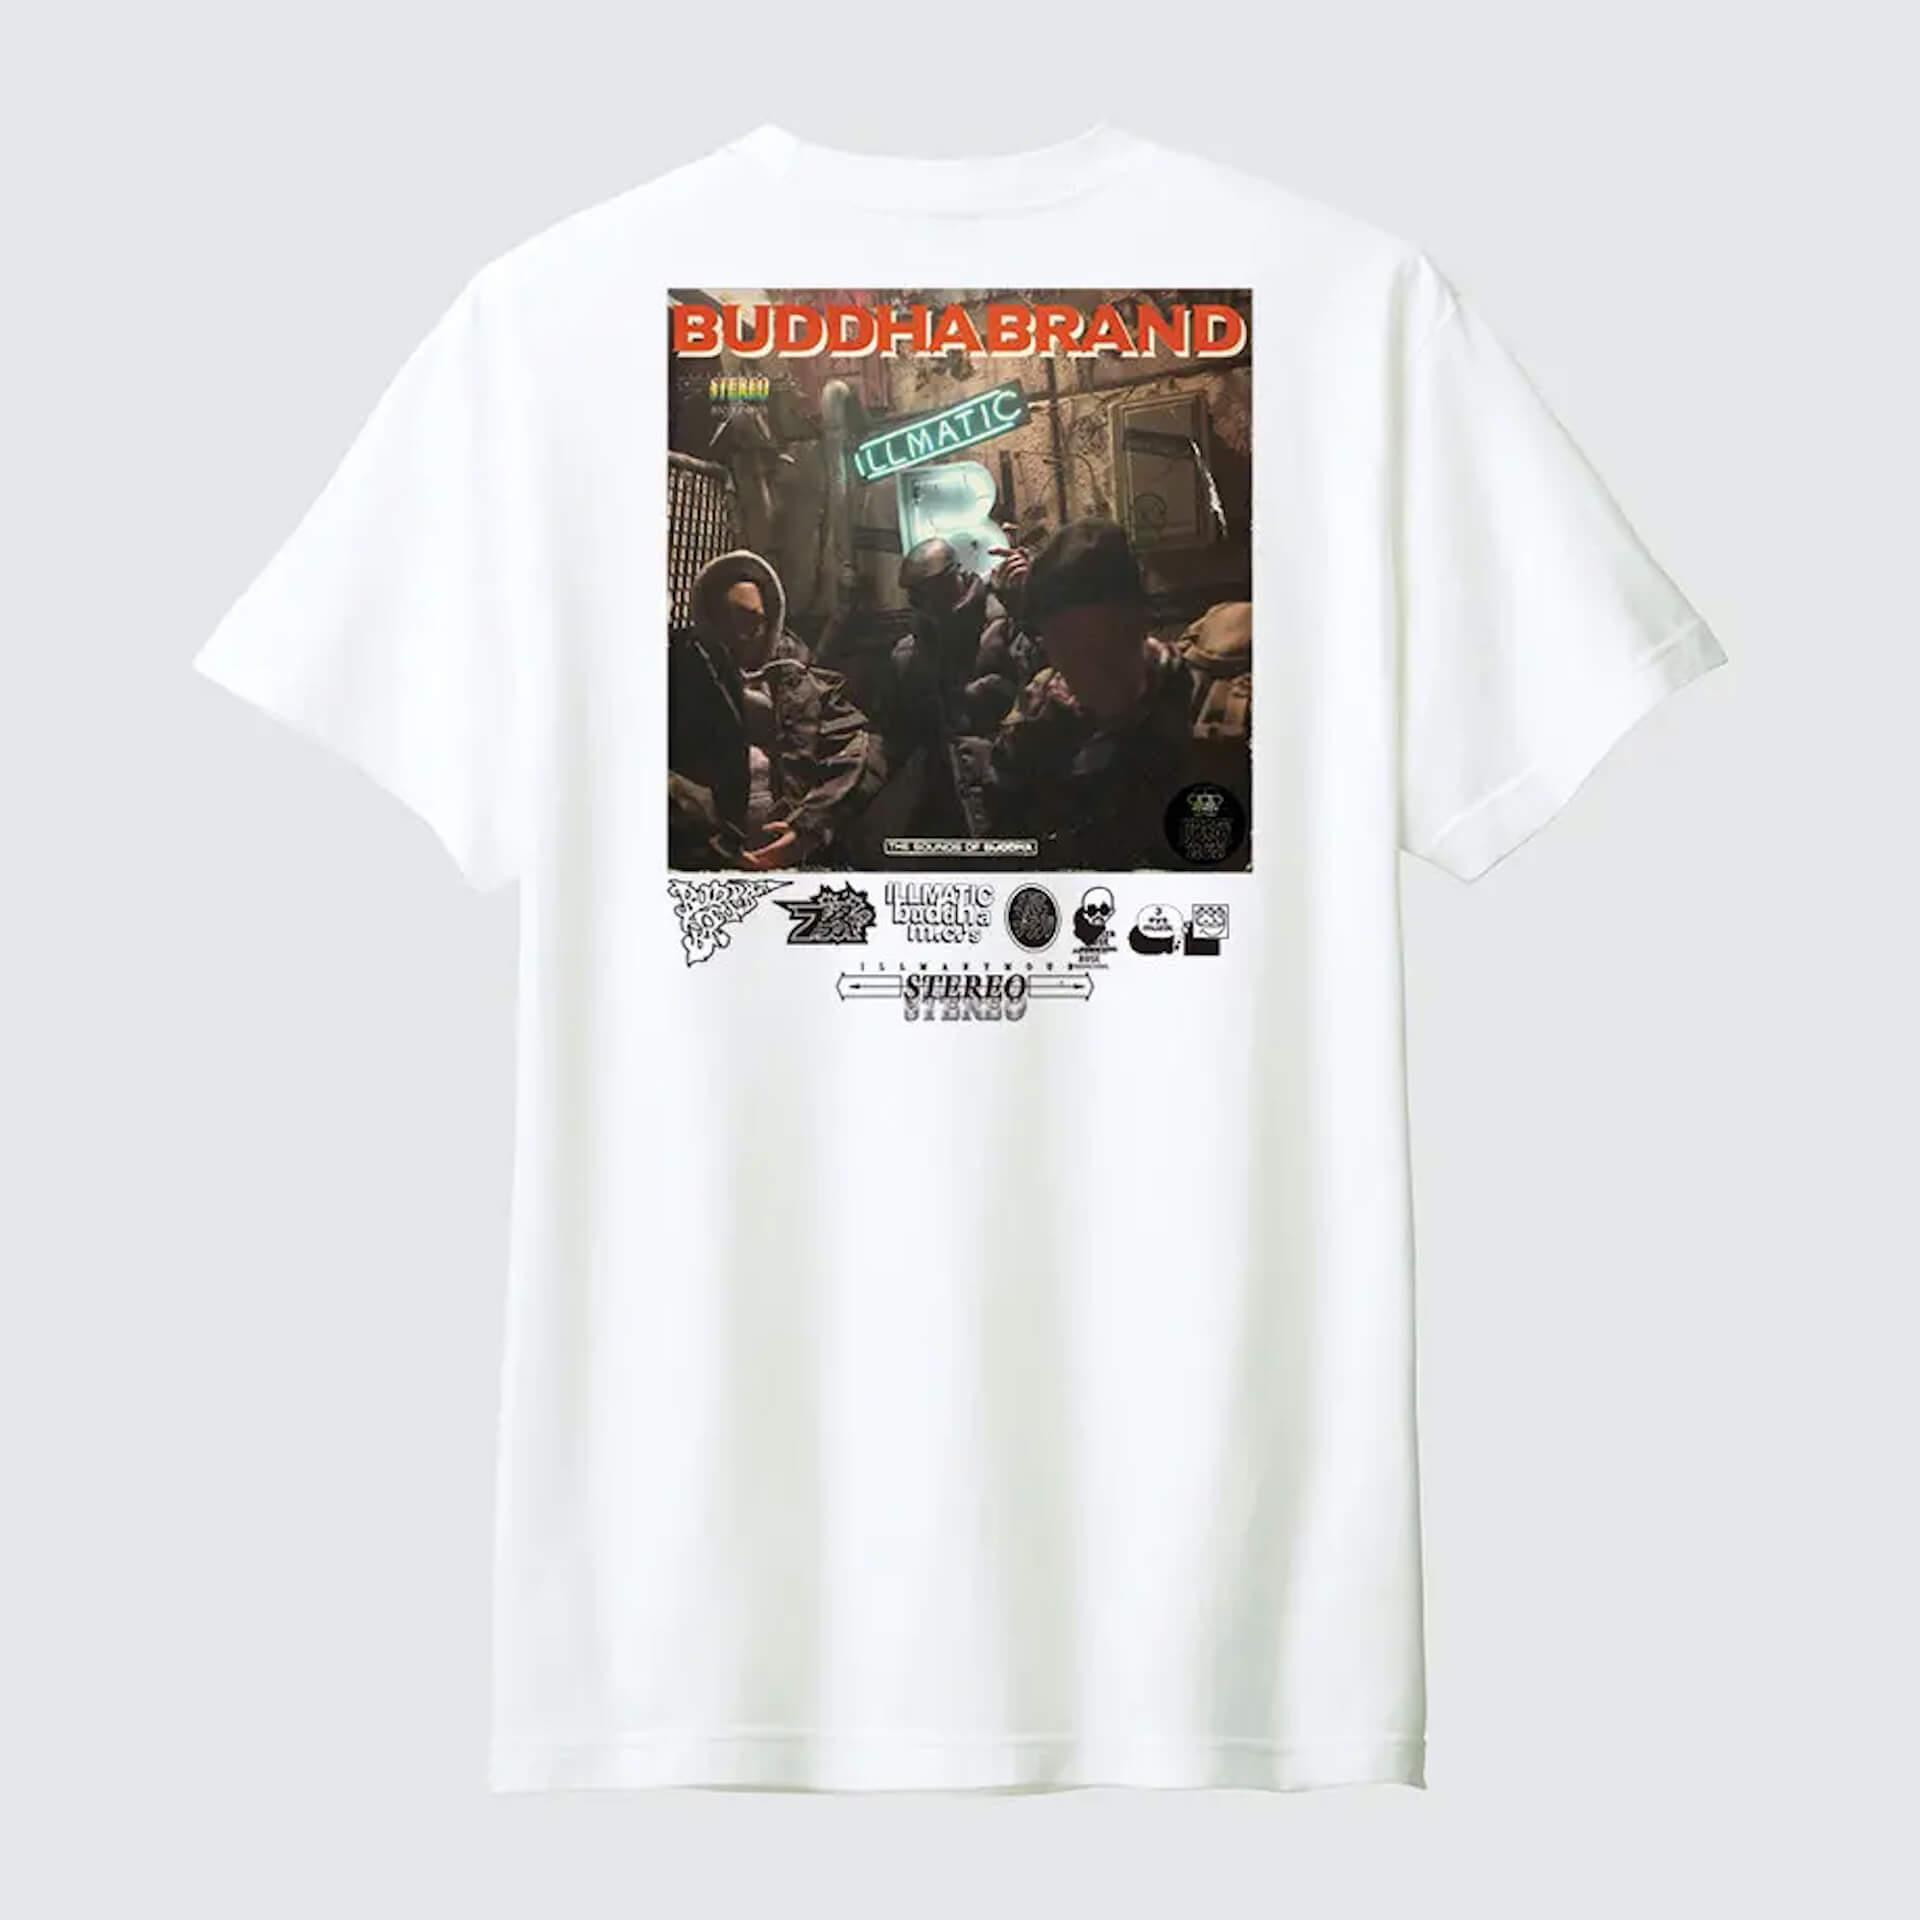 Buddha Brandが『これがブッダブランド!』のTシャツとアルバムをデジタルダウンロードできるセットをリリース決定! music210825_buddha_brand_1